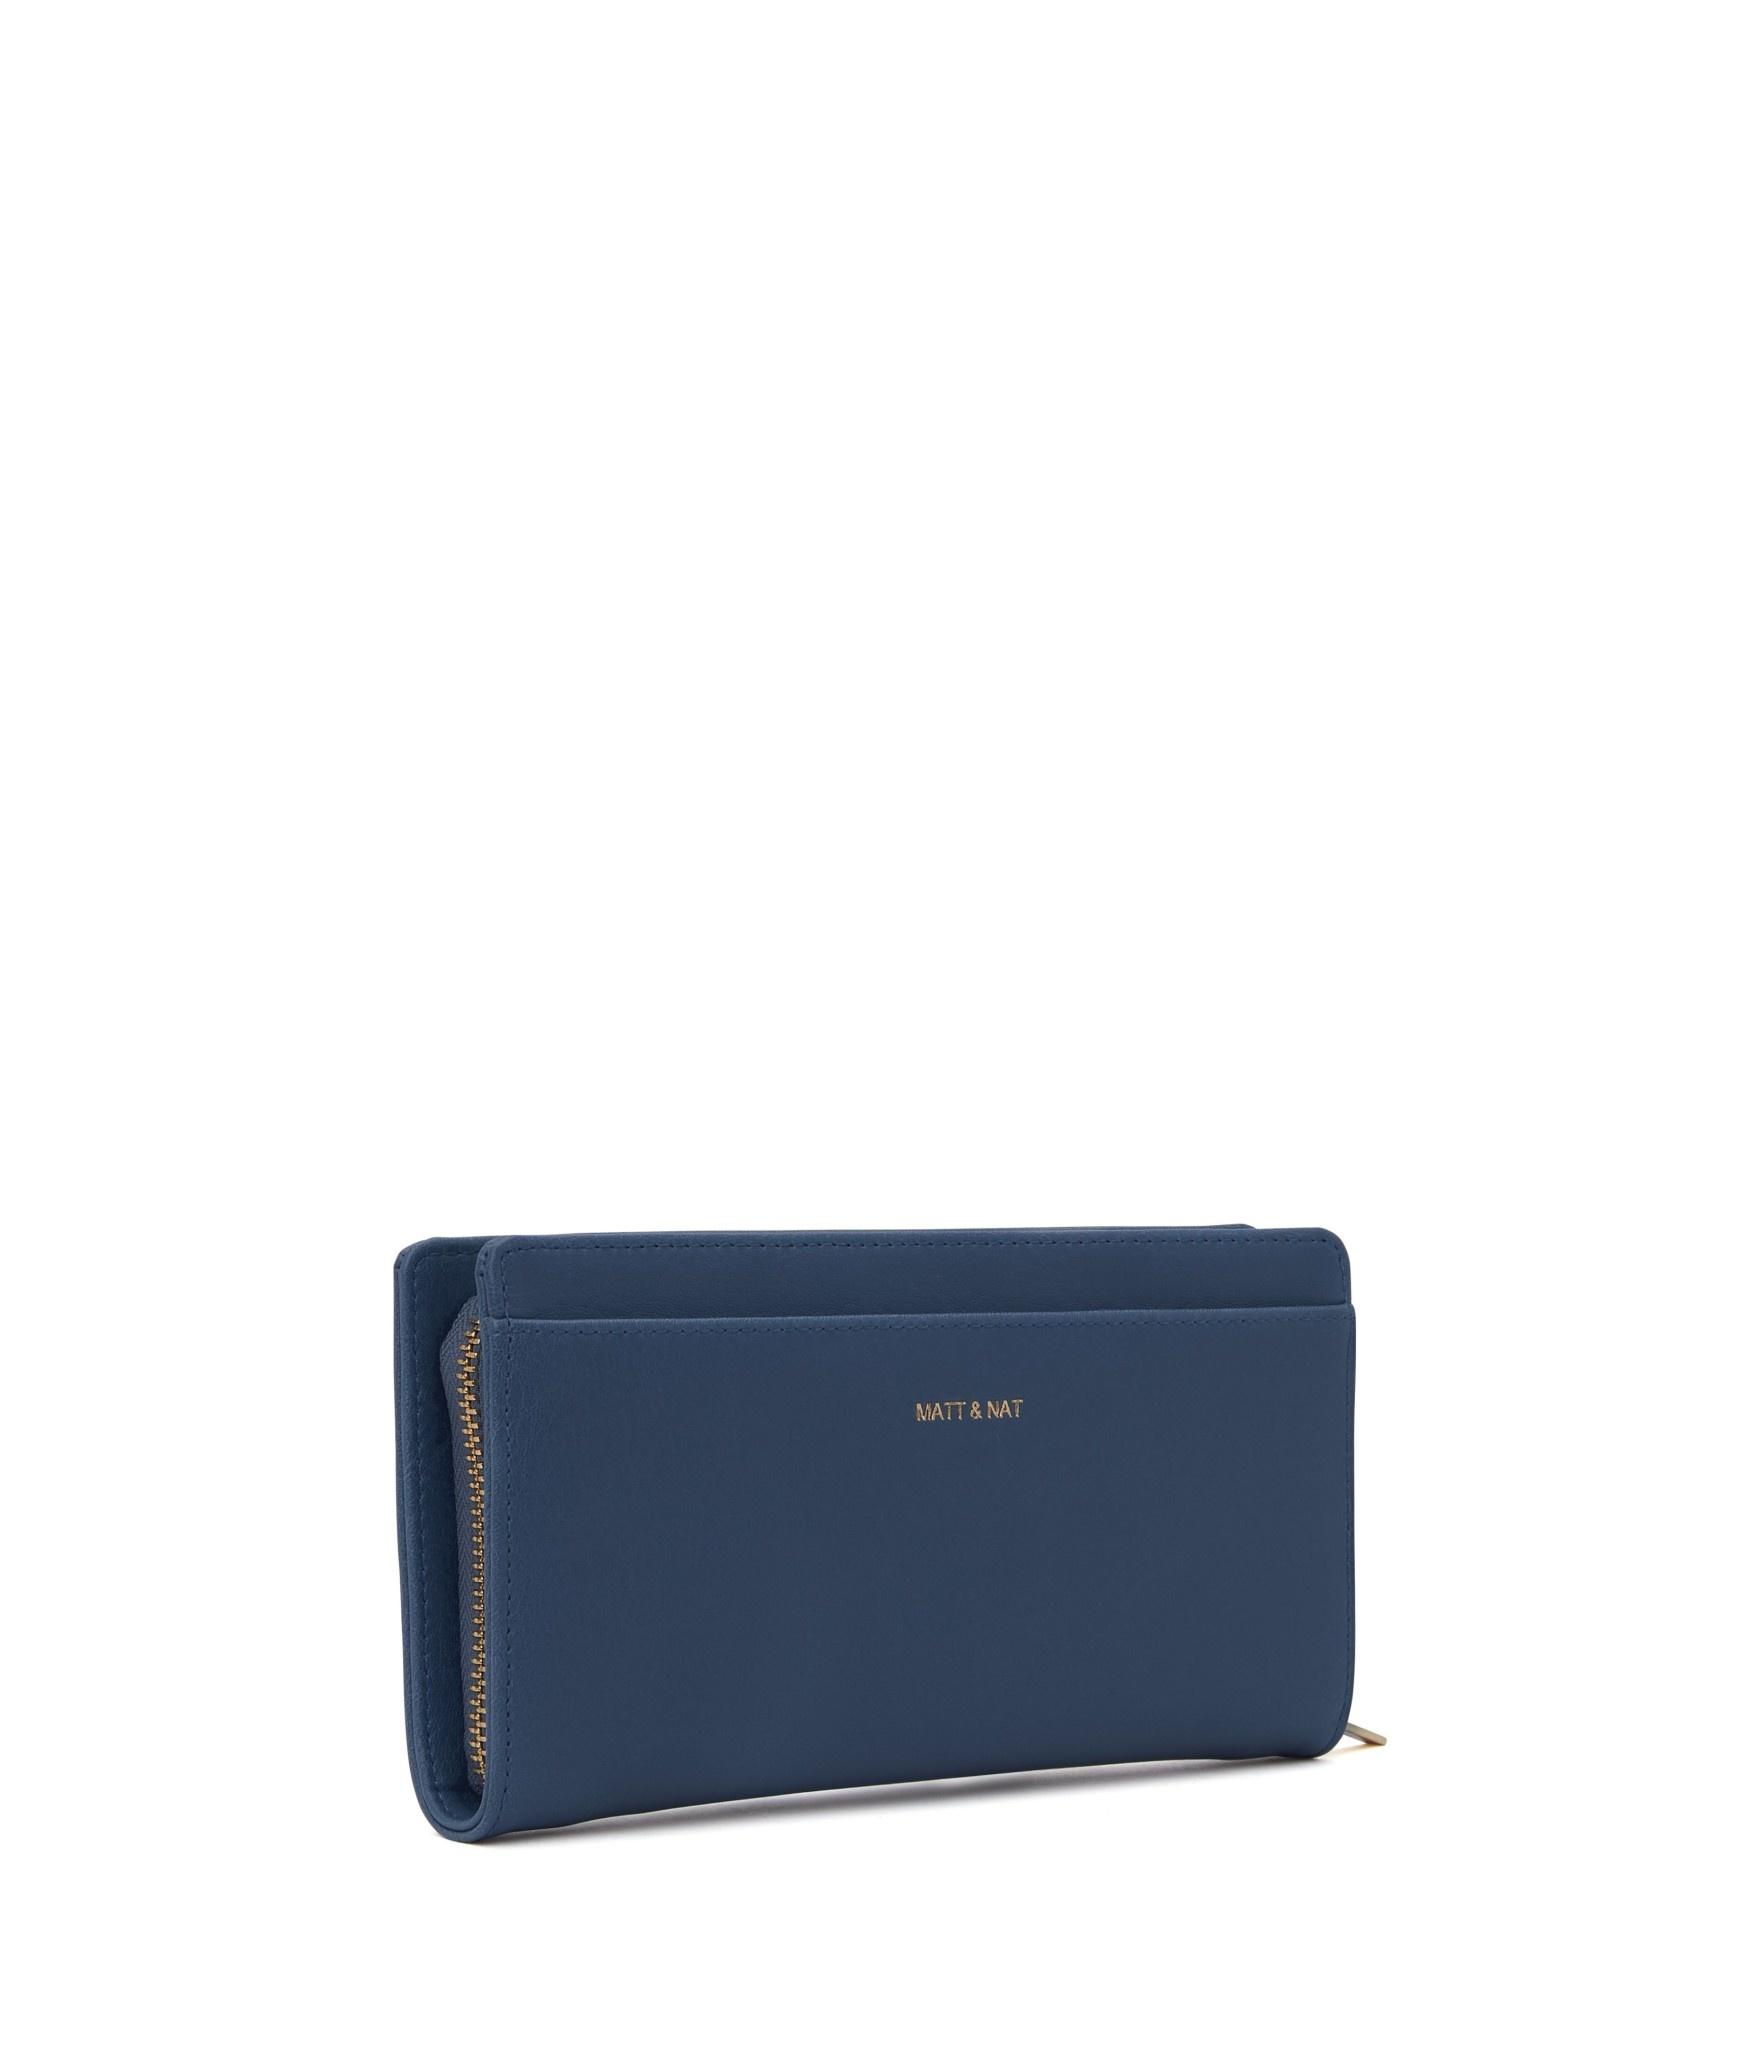 Webber Vintage Wallet Cosmo Blue-3